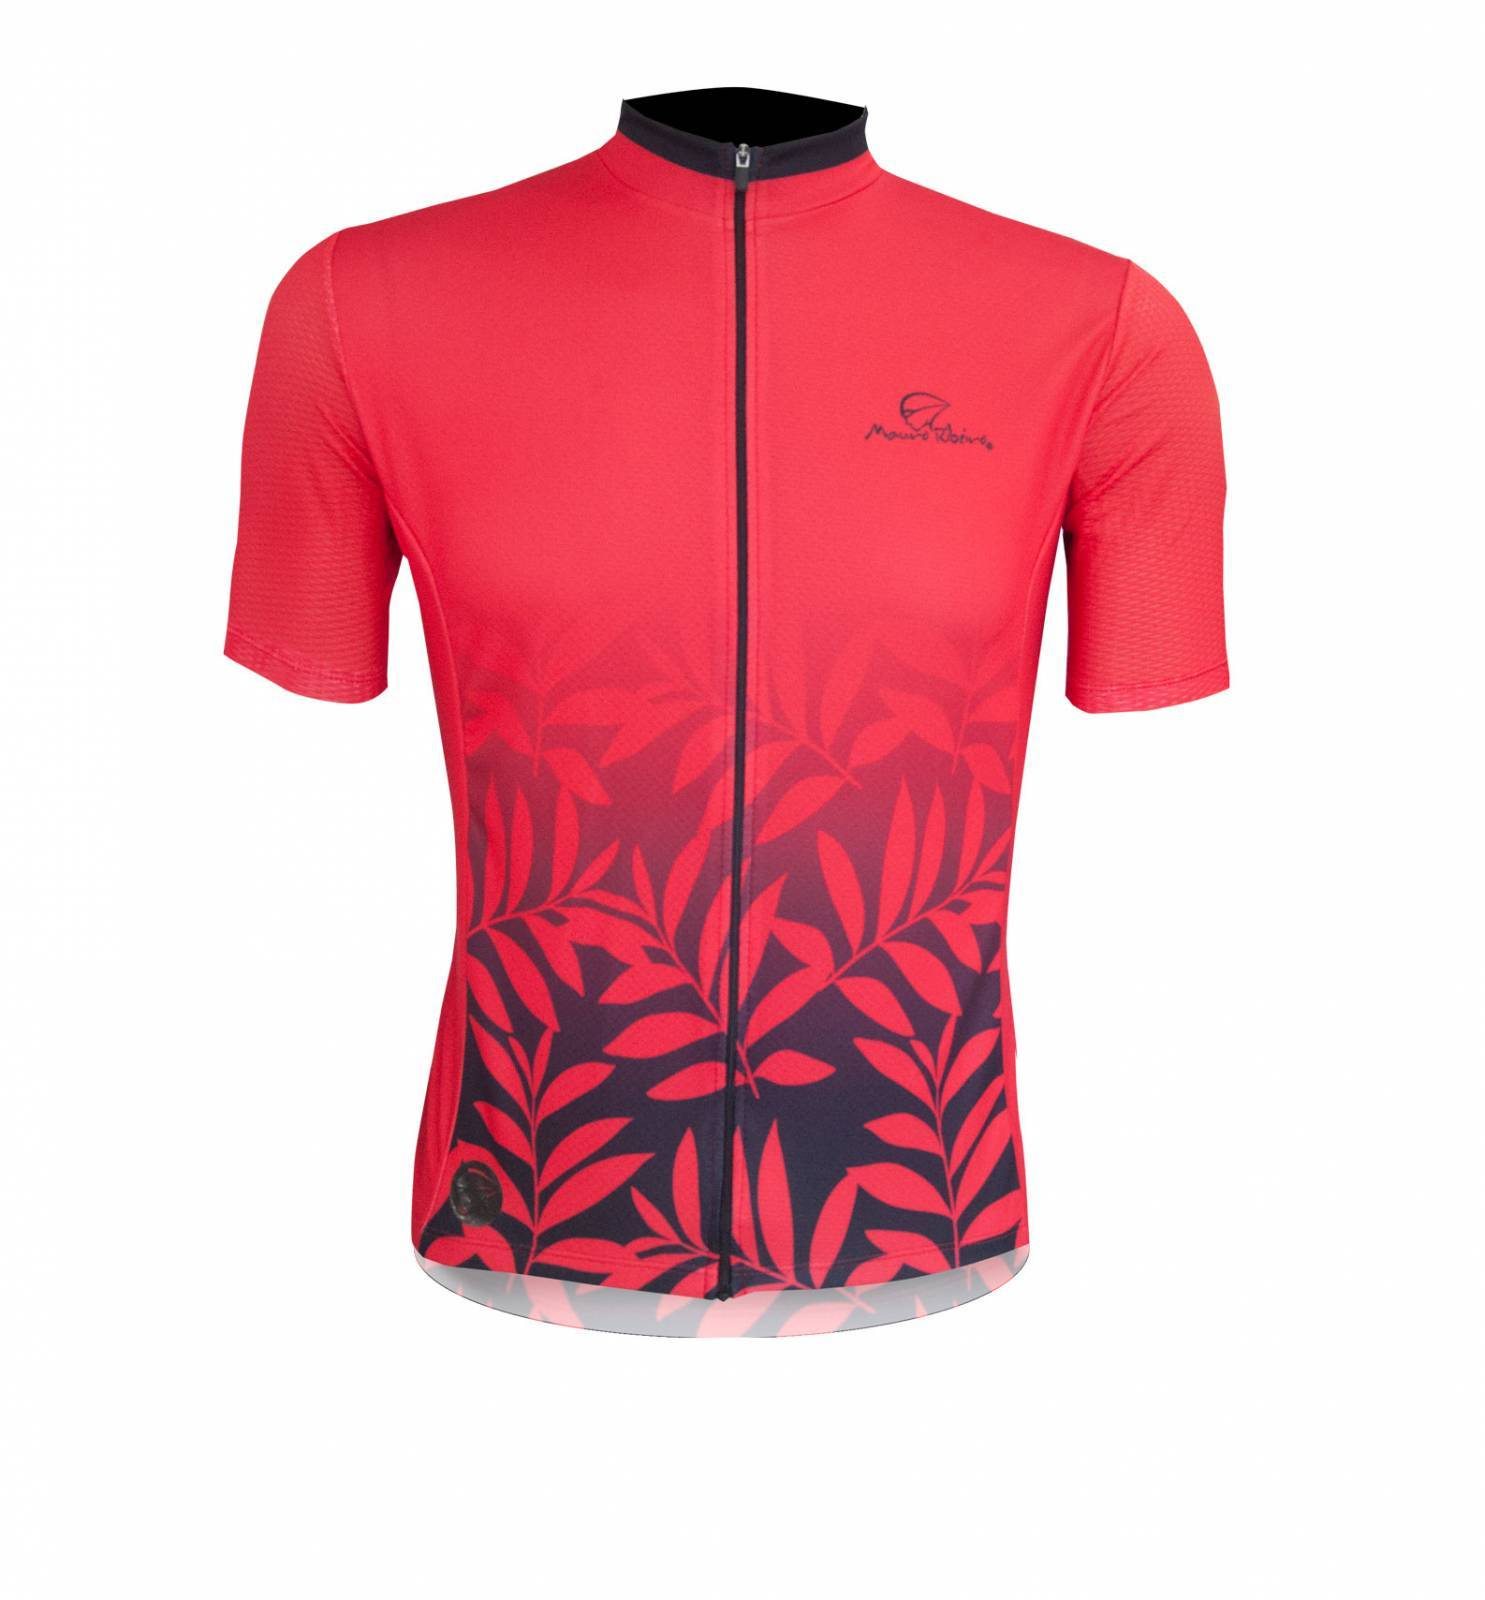 Camisa Mauro Ribeiro Leaf - BIKE ALLA CARTE